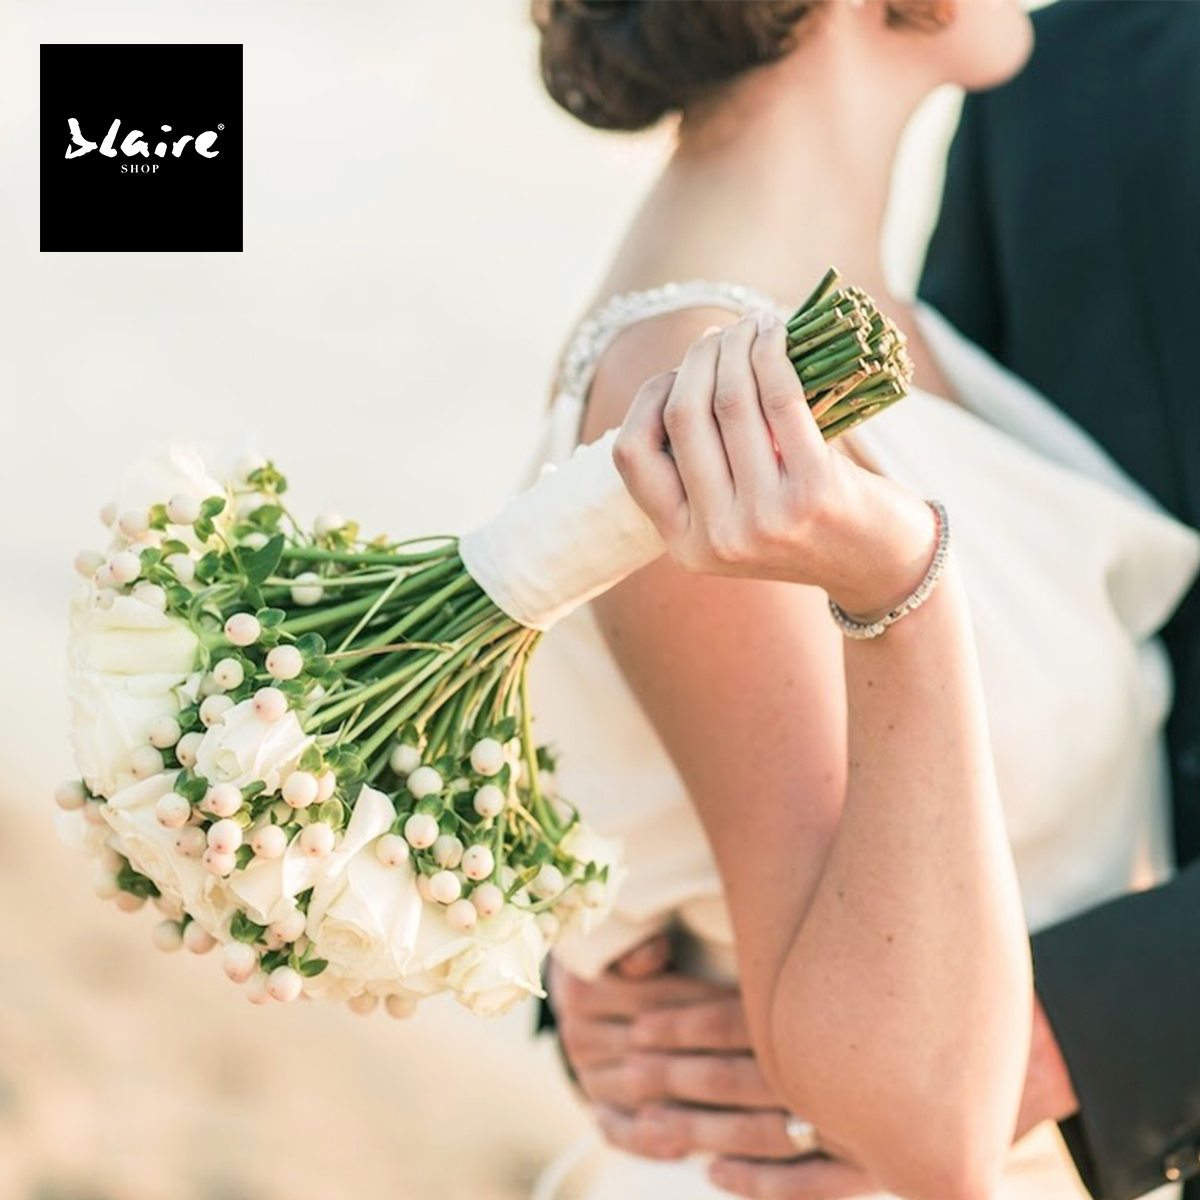 S Blaire na svatbu